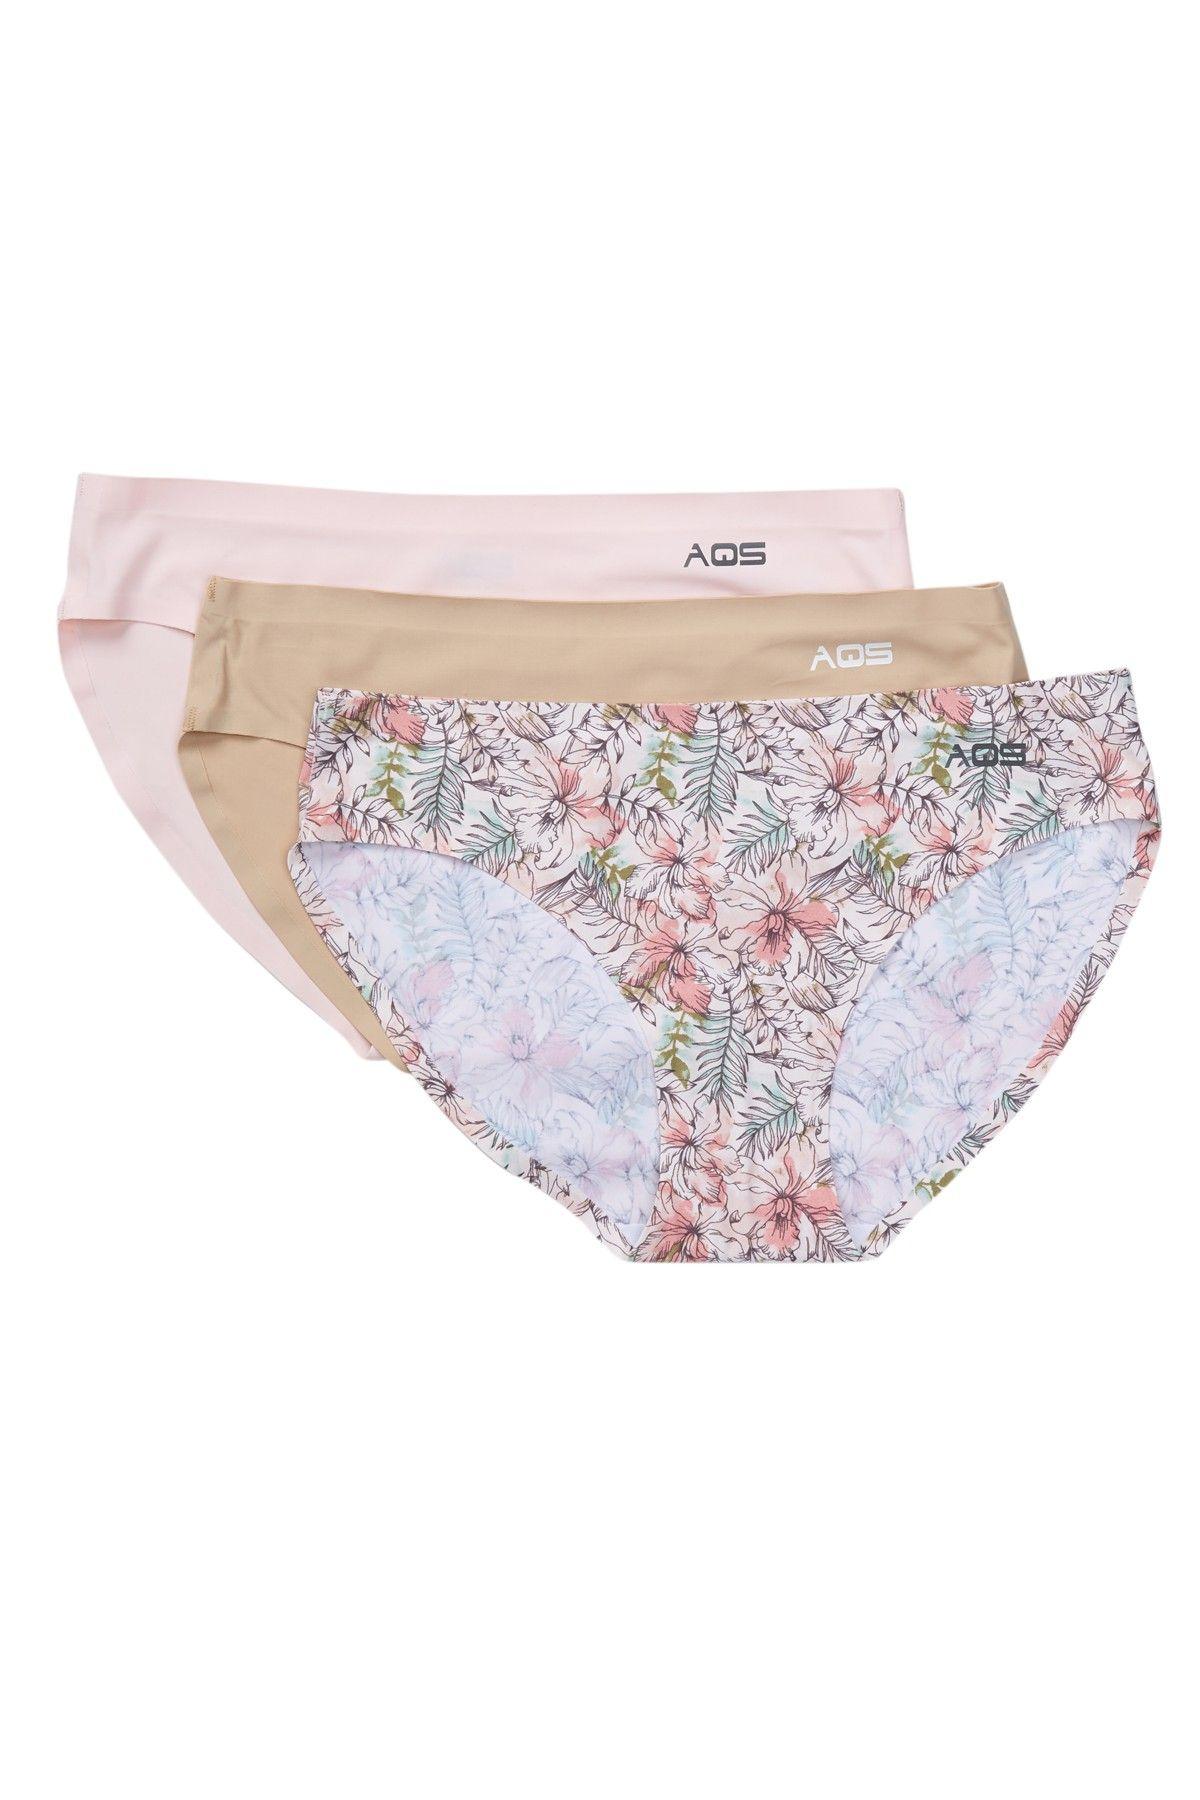 4c7331a7b56 Assorted Seamless Bikini Cut Panty - Pack of 3